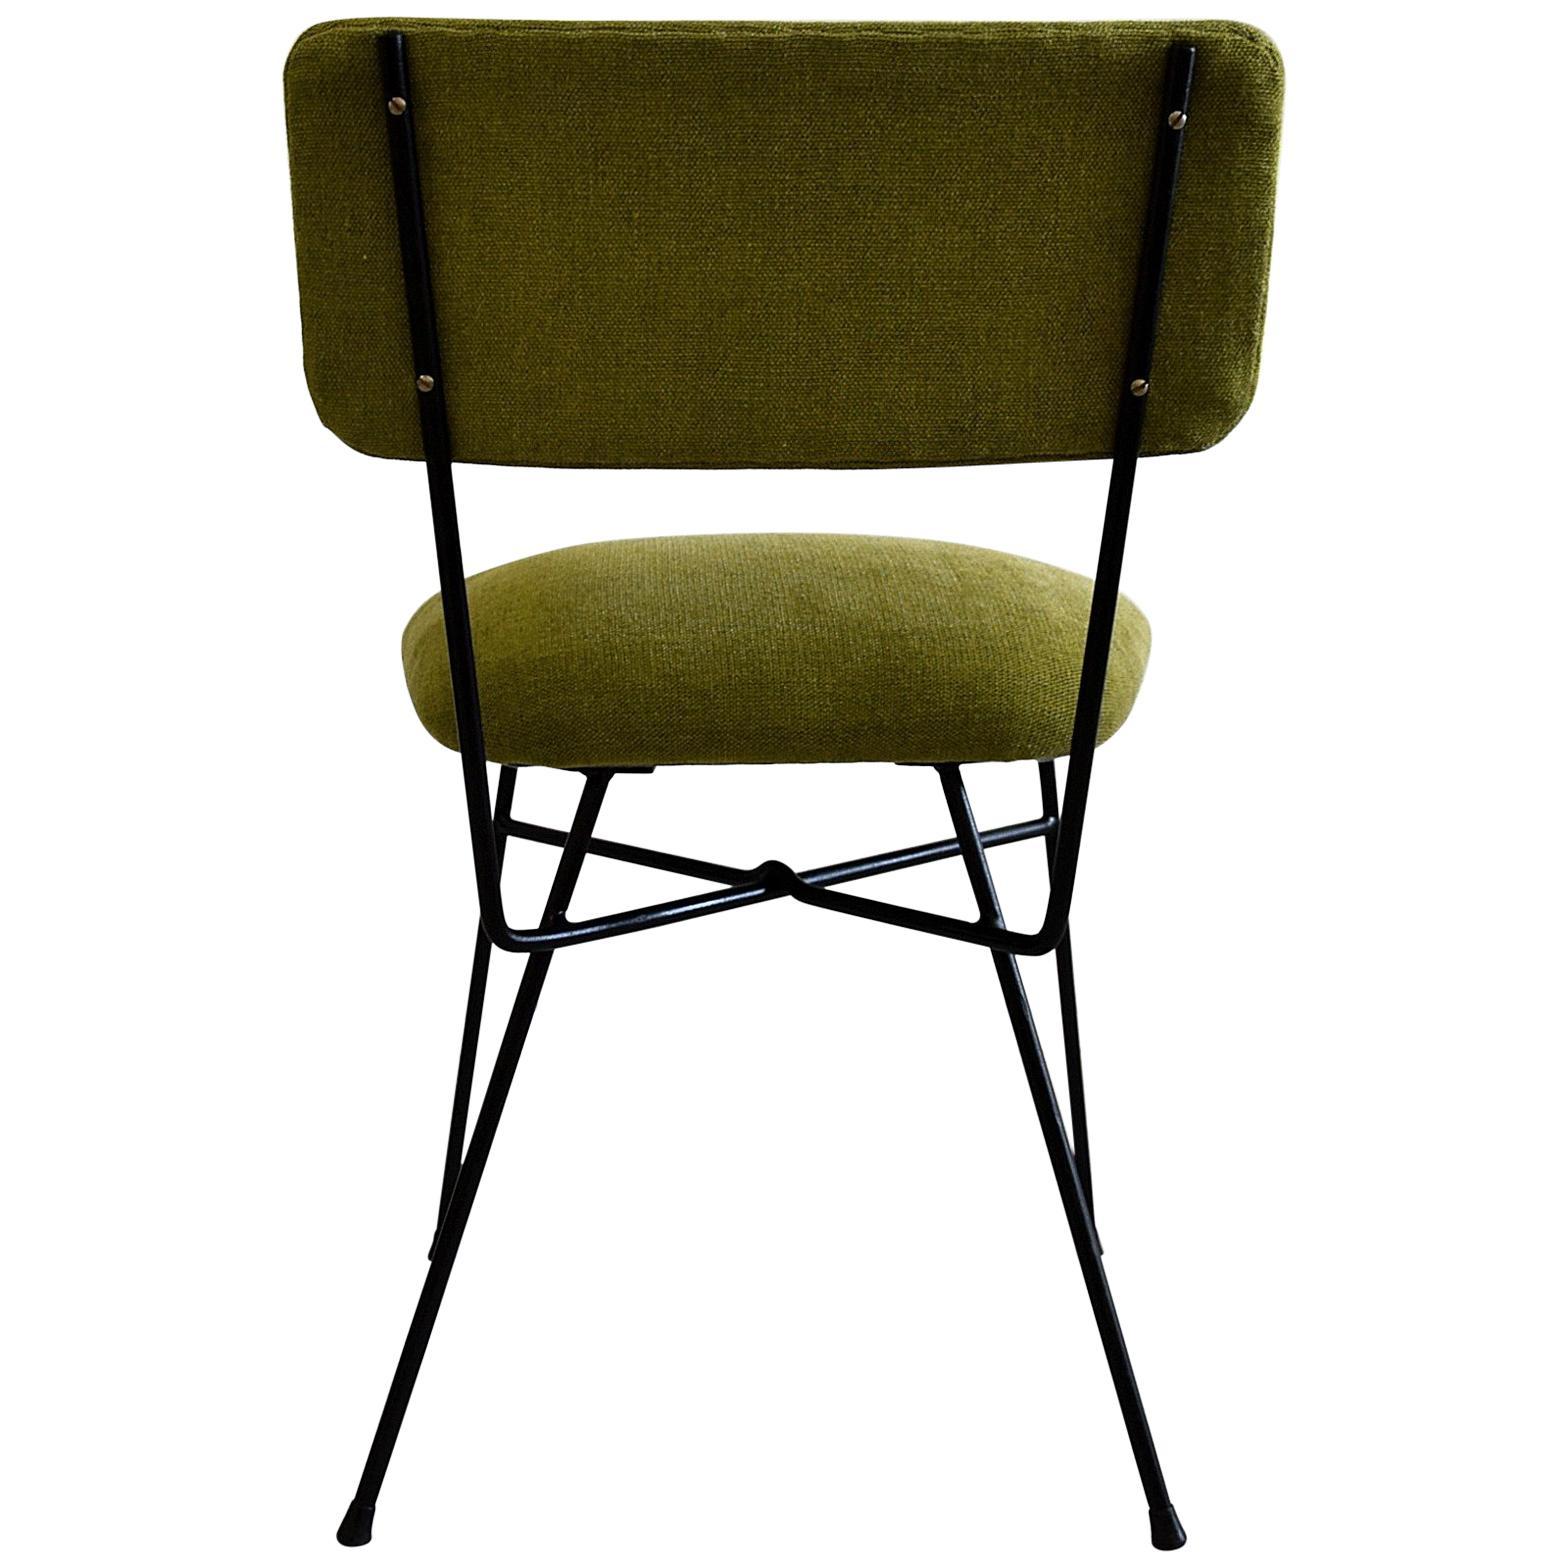 Elettra by Studio BBPR for Arflex Green Mid Century Modern Chair